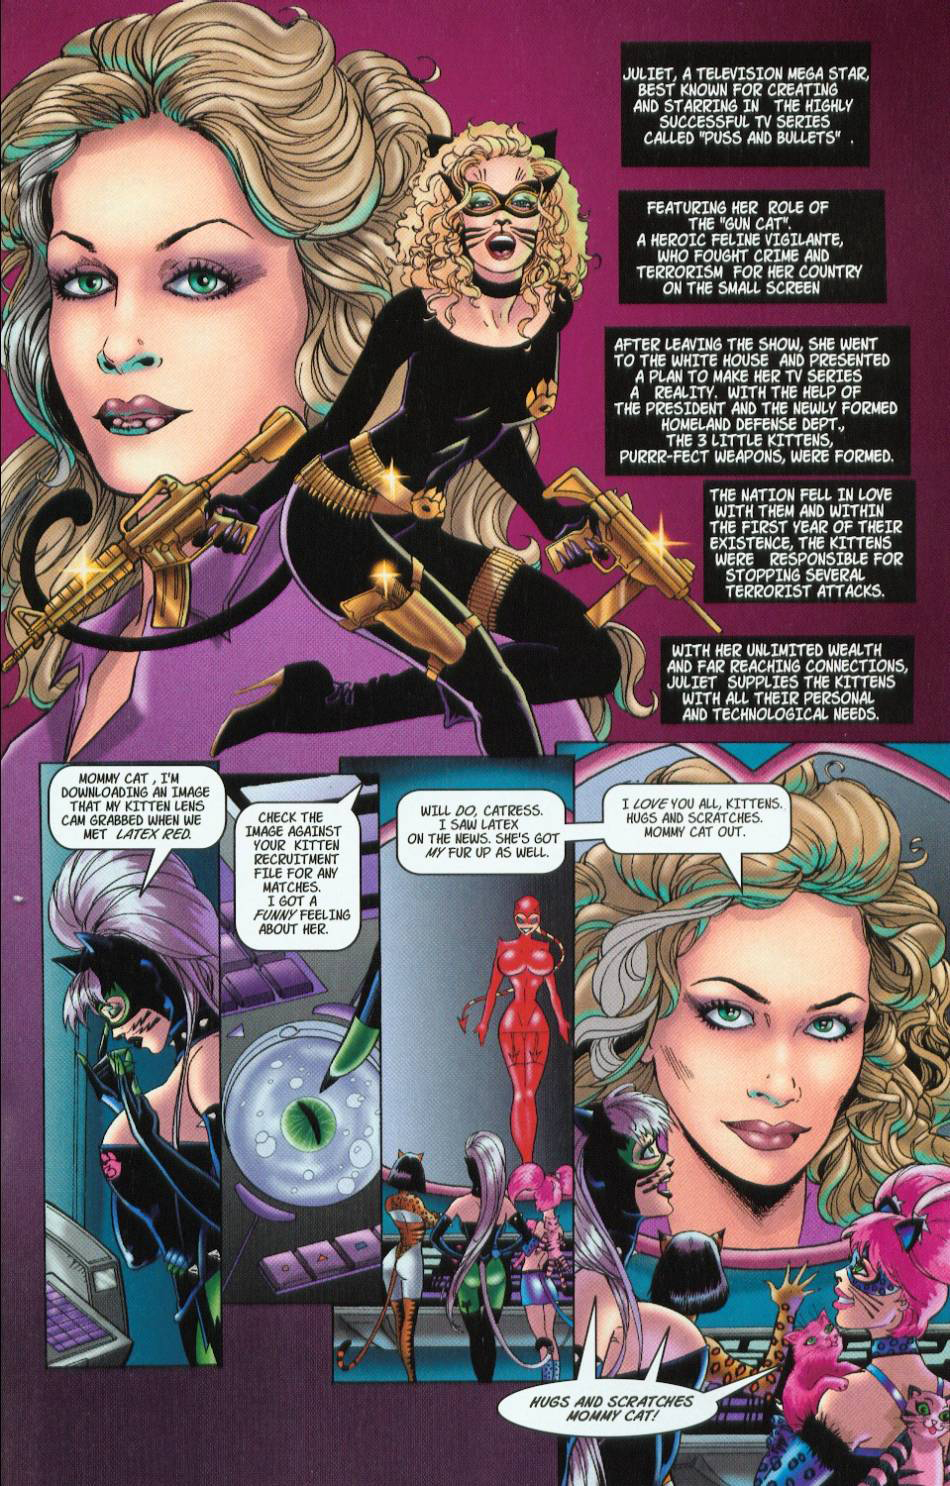 Read online 3 Little Kittens: Purrr-fect Weapons comic -  Issue #1 - 25